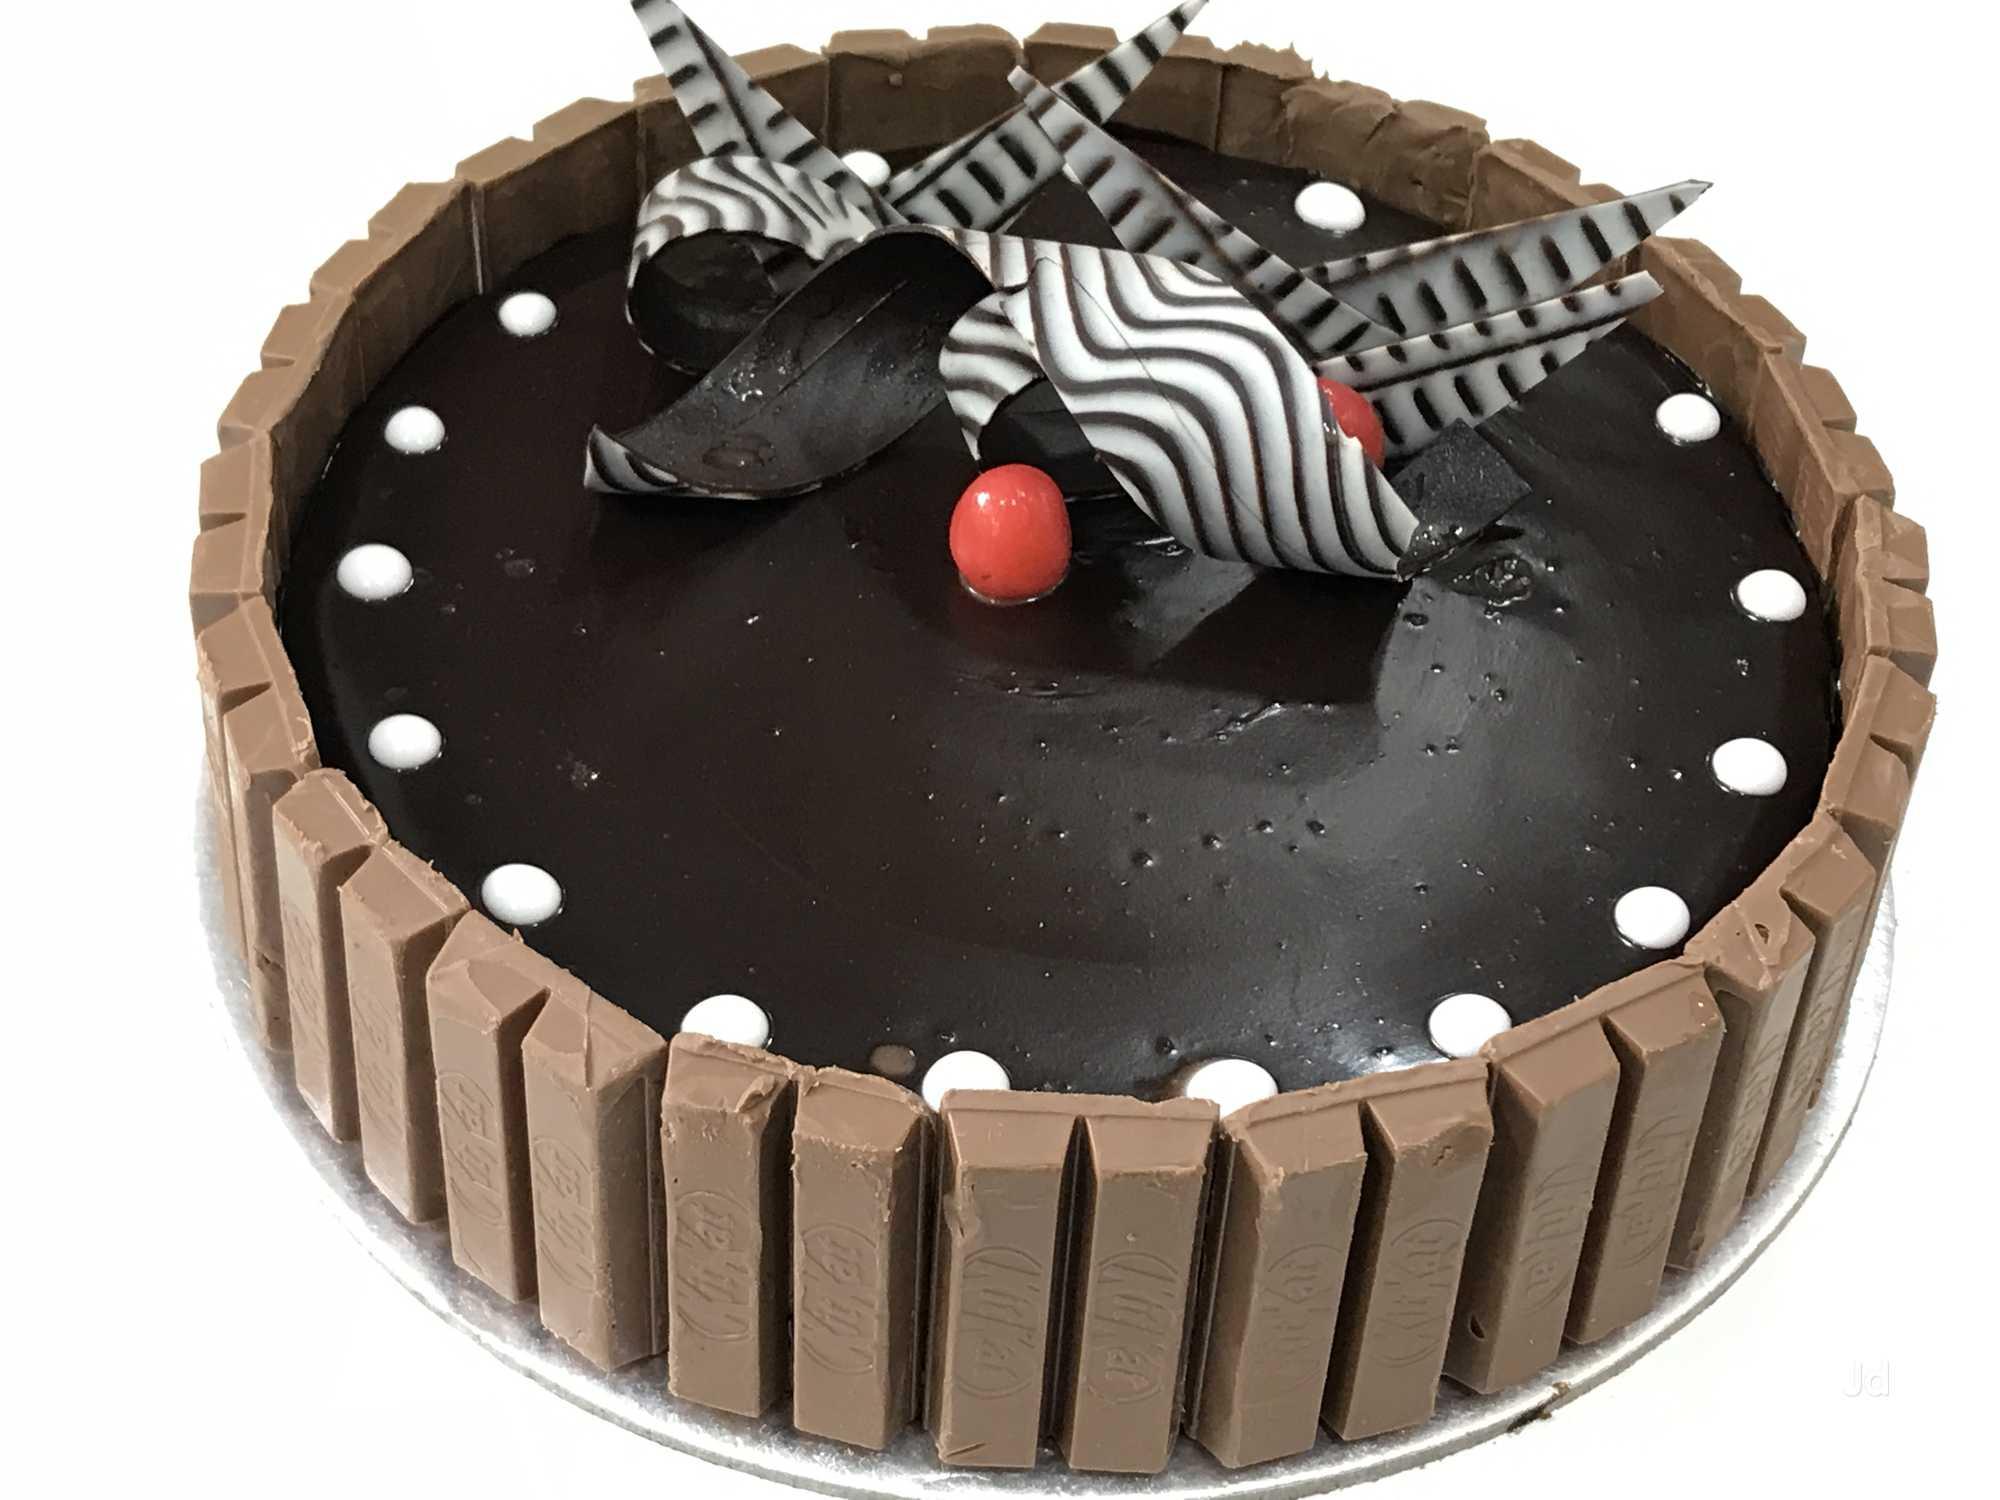 Top 20 Cake Shops In Darya Ganj Best Pastry Shops Darya